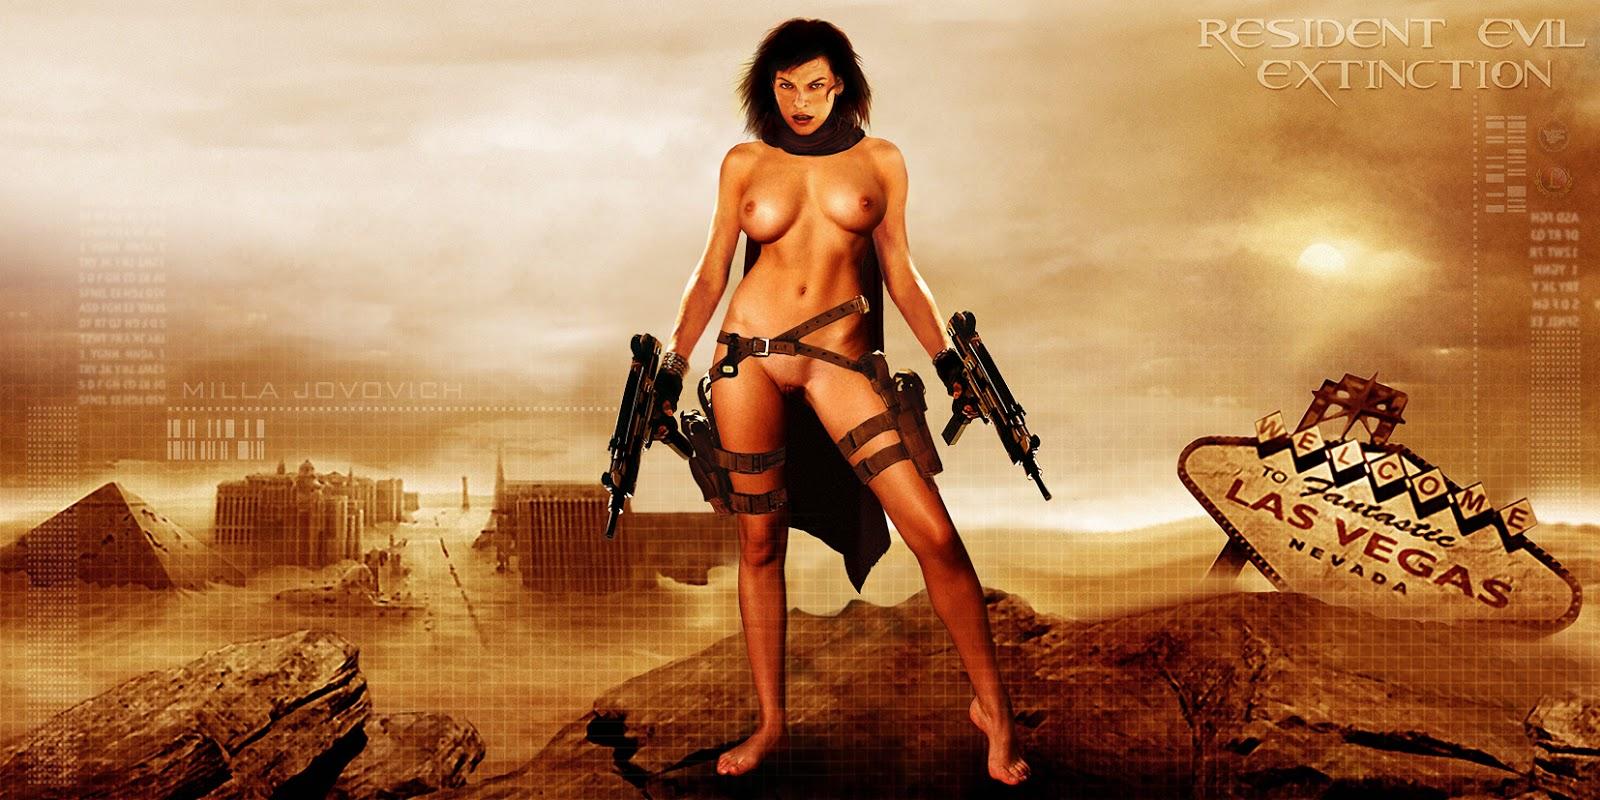 Milla Jovovich Nude Resident Evil Poster Uhq